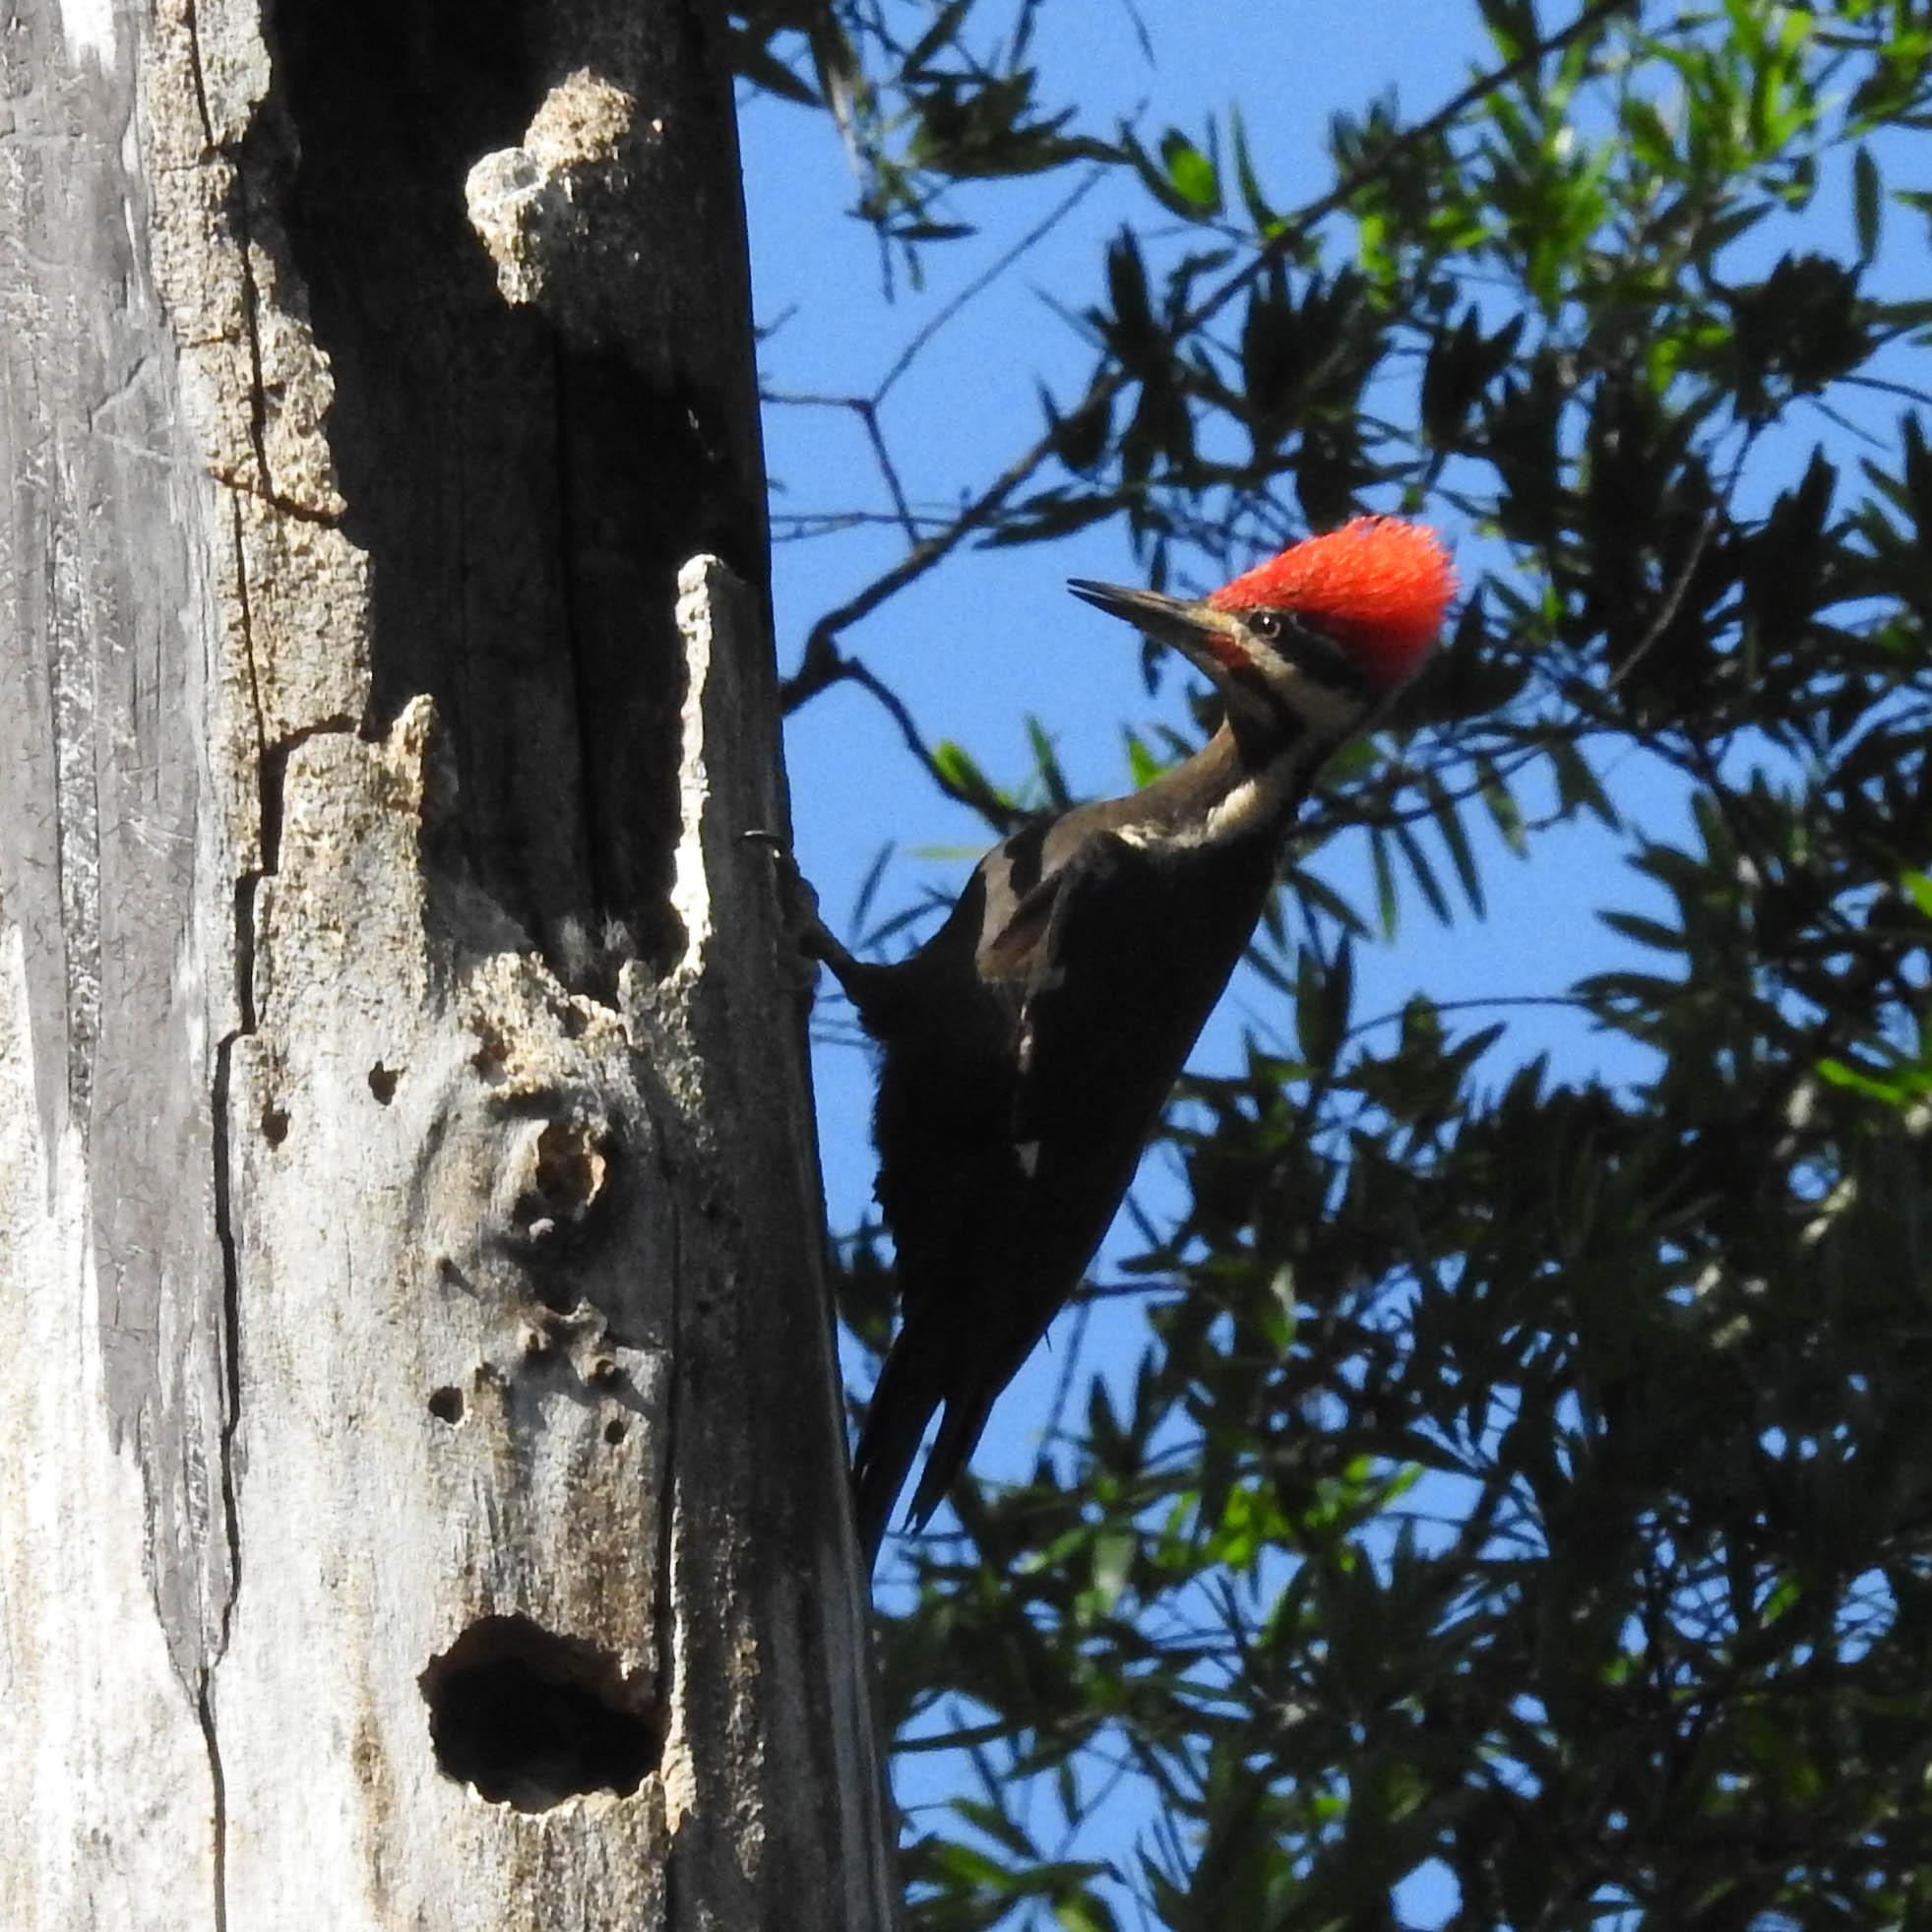 Pileated Woodpecker, male